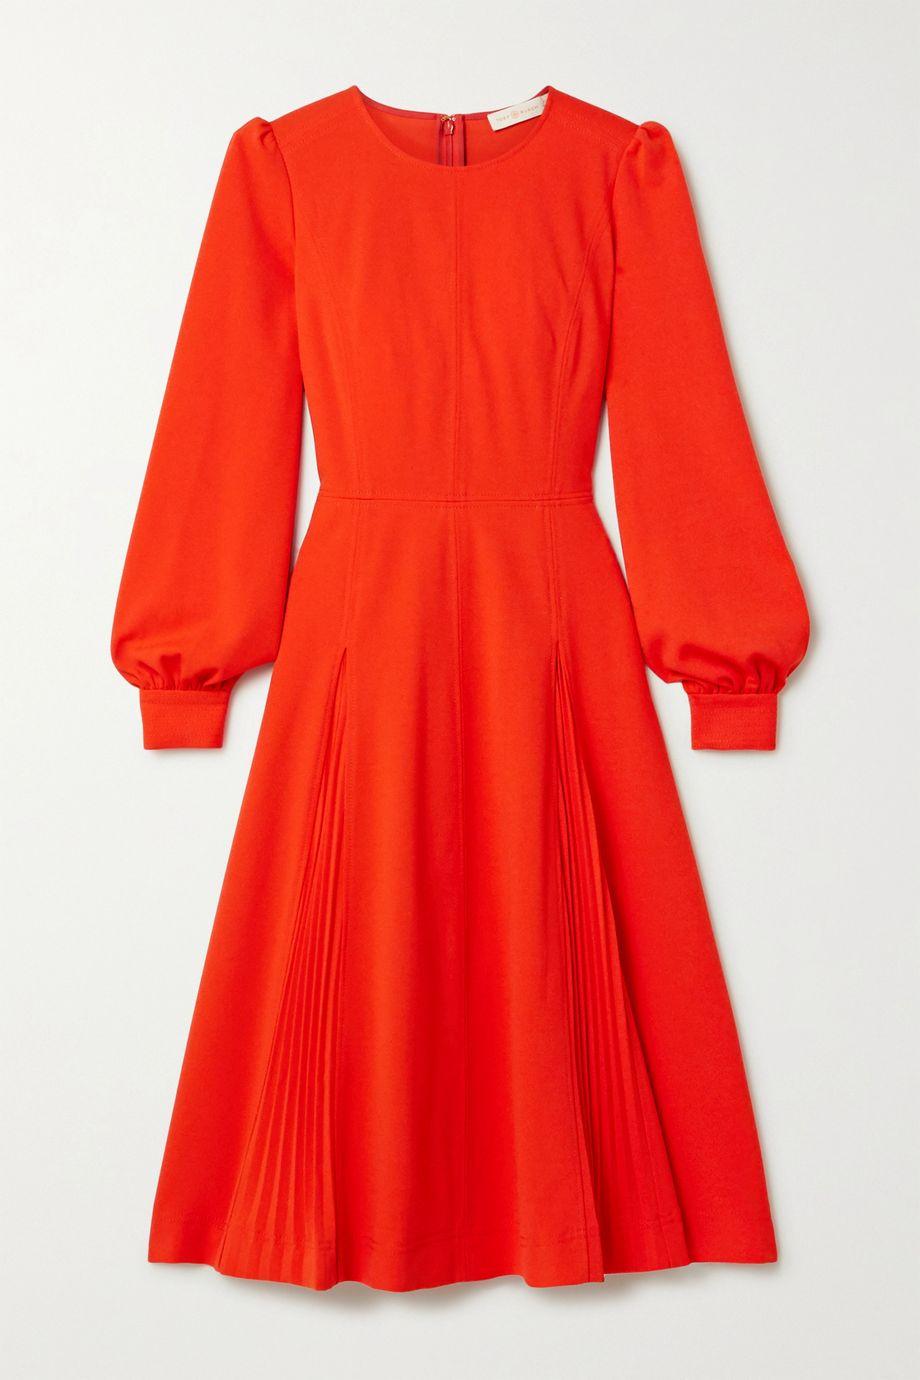 Tory Burch Pleated crepe dress